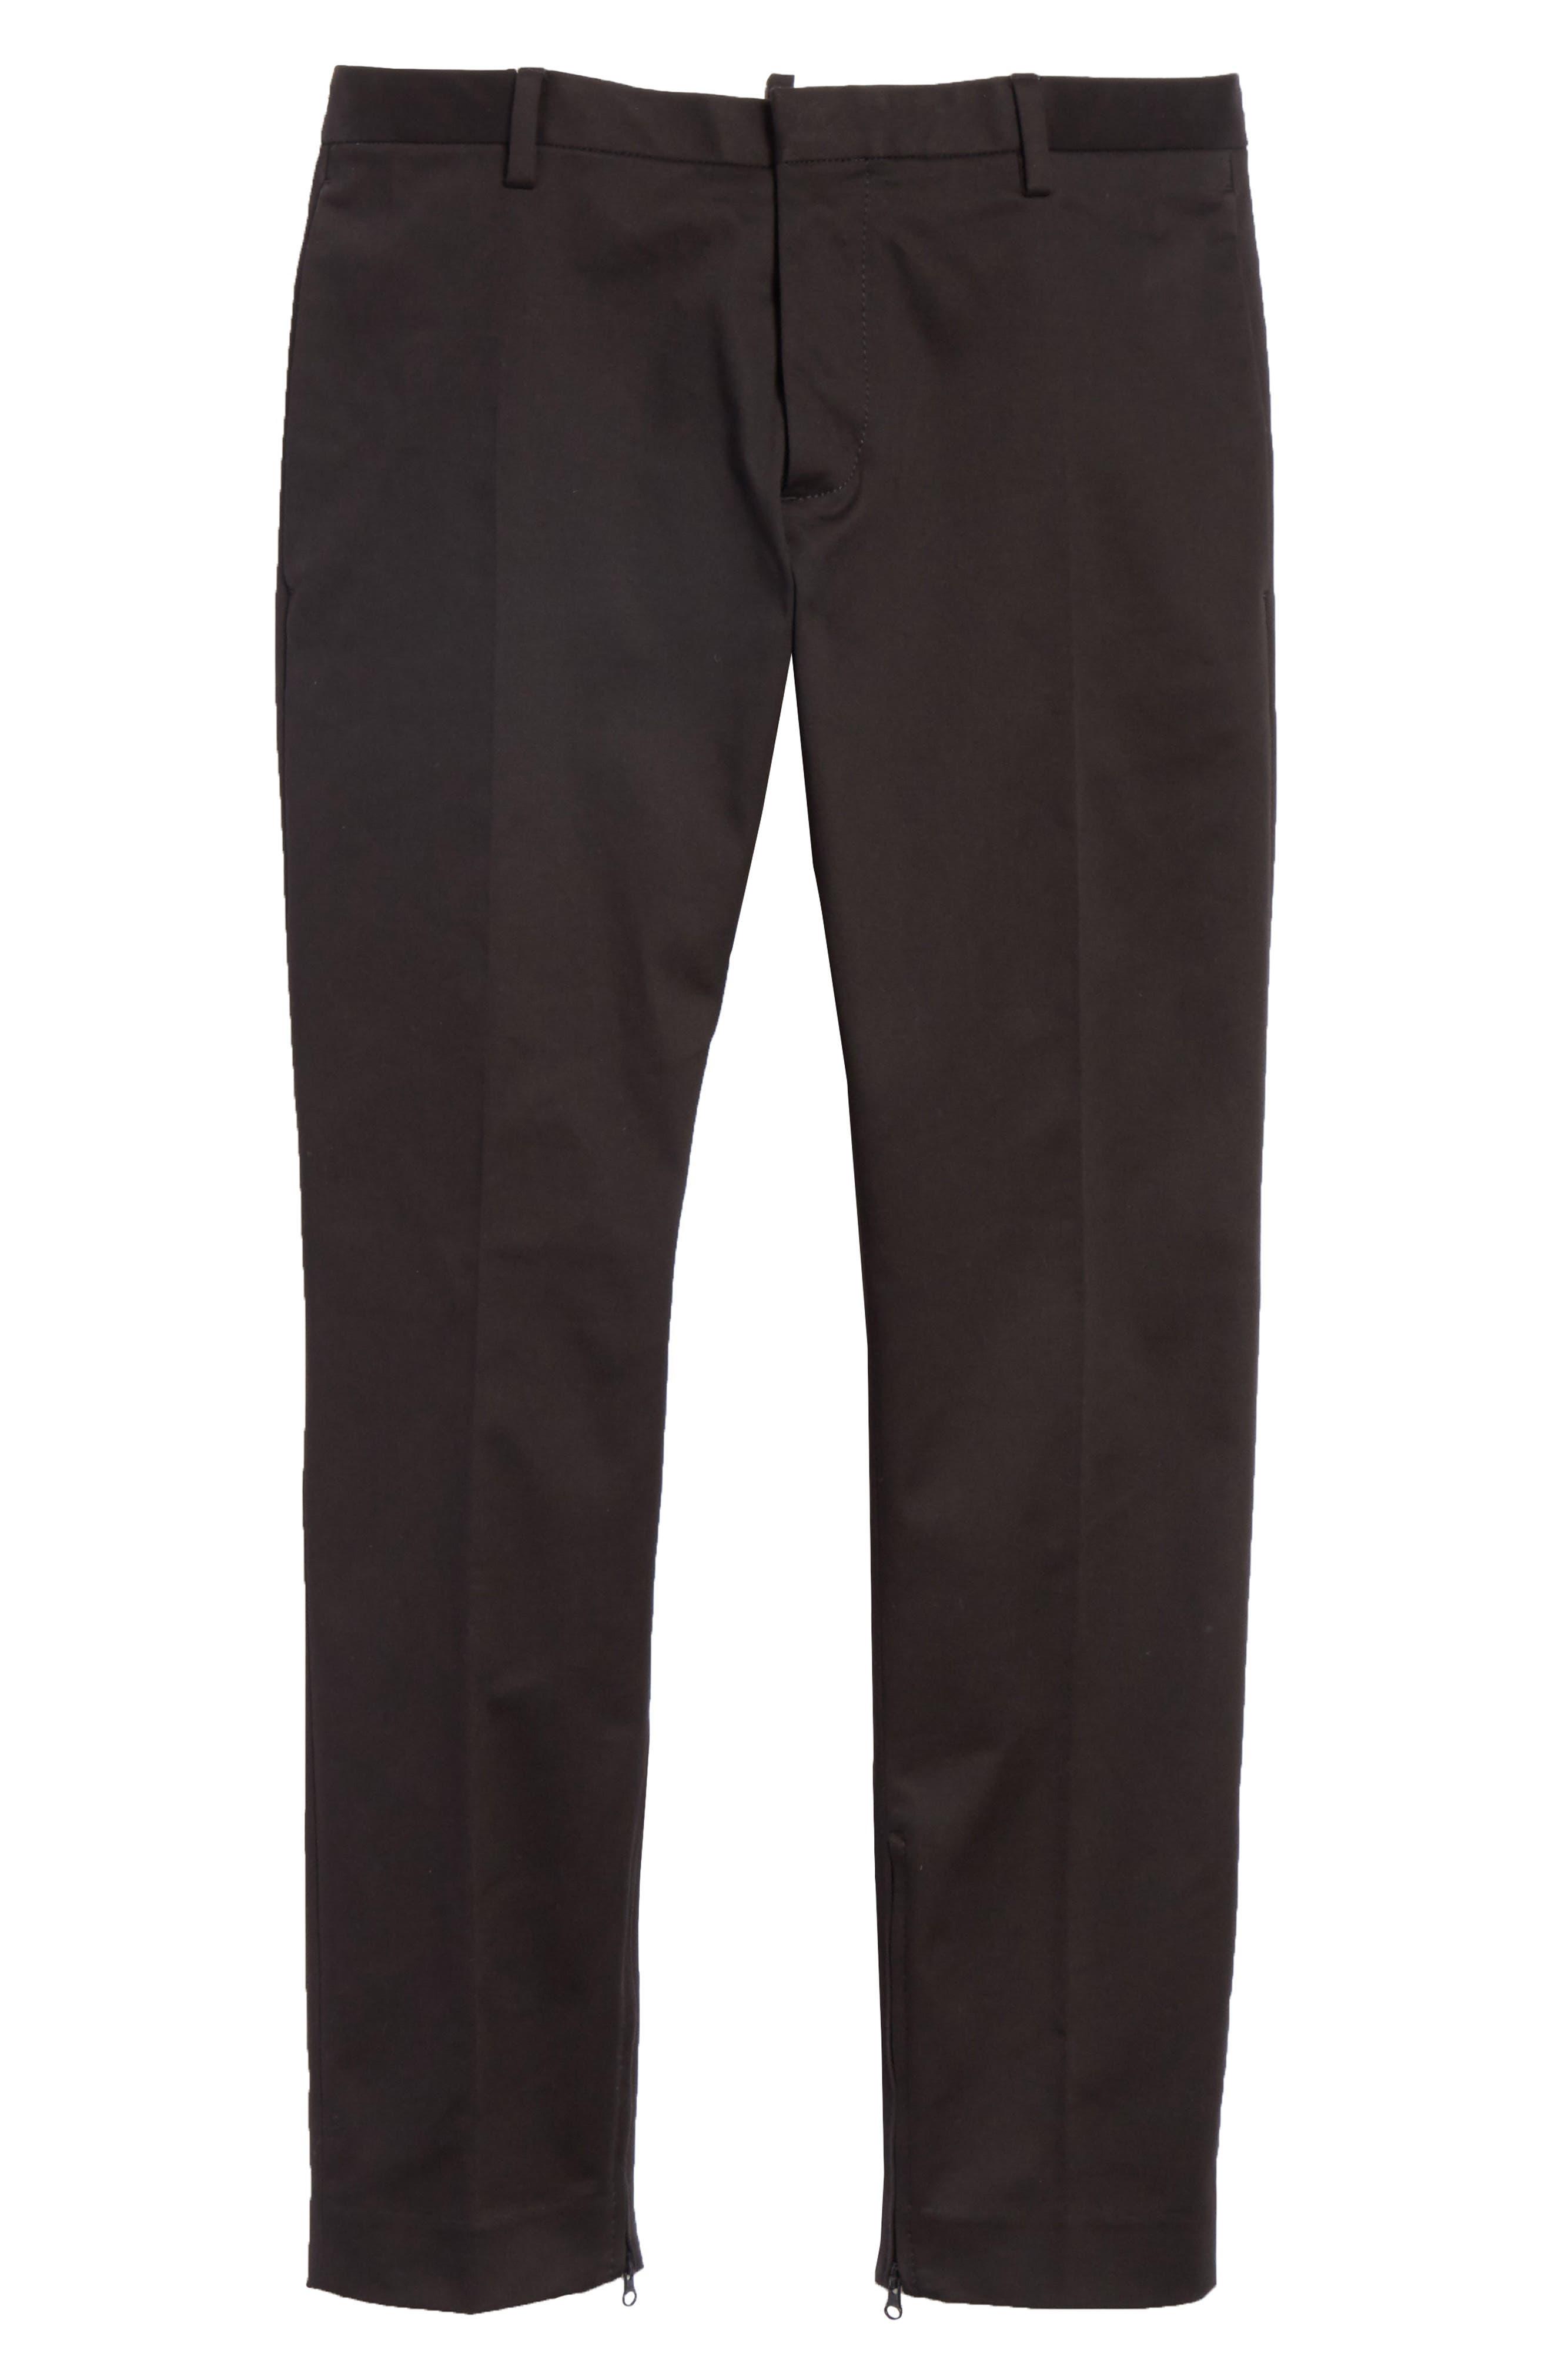 Dan Skinny Fit Cropped Trousers,                             Alternate thumbnail 6, color,                             001